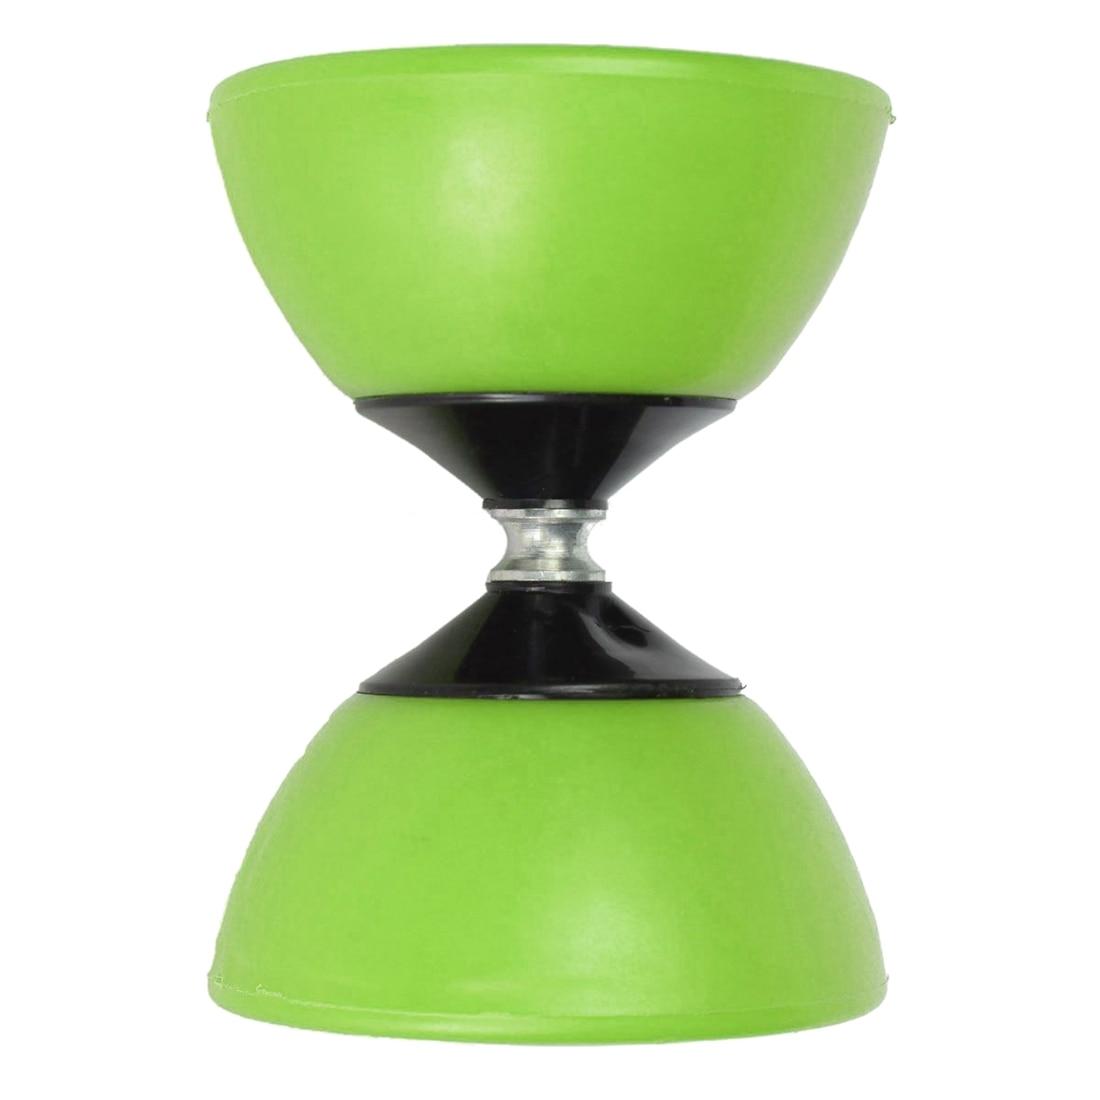 HOT SALE Big Bowl Diabolo + Plastic Sticks - Chinese YoYo Juggling Toy Gift